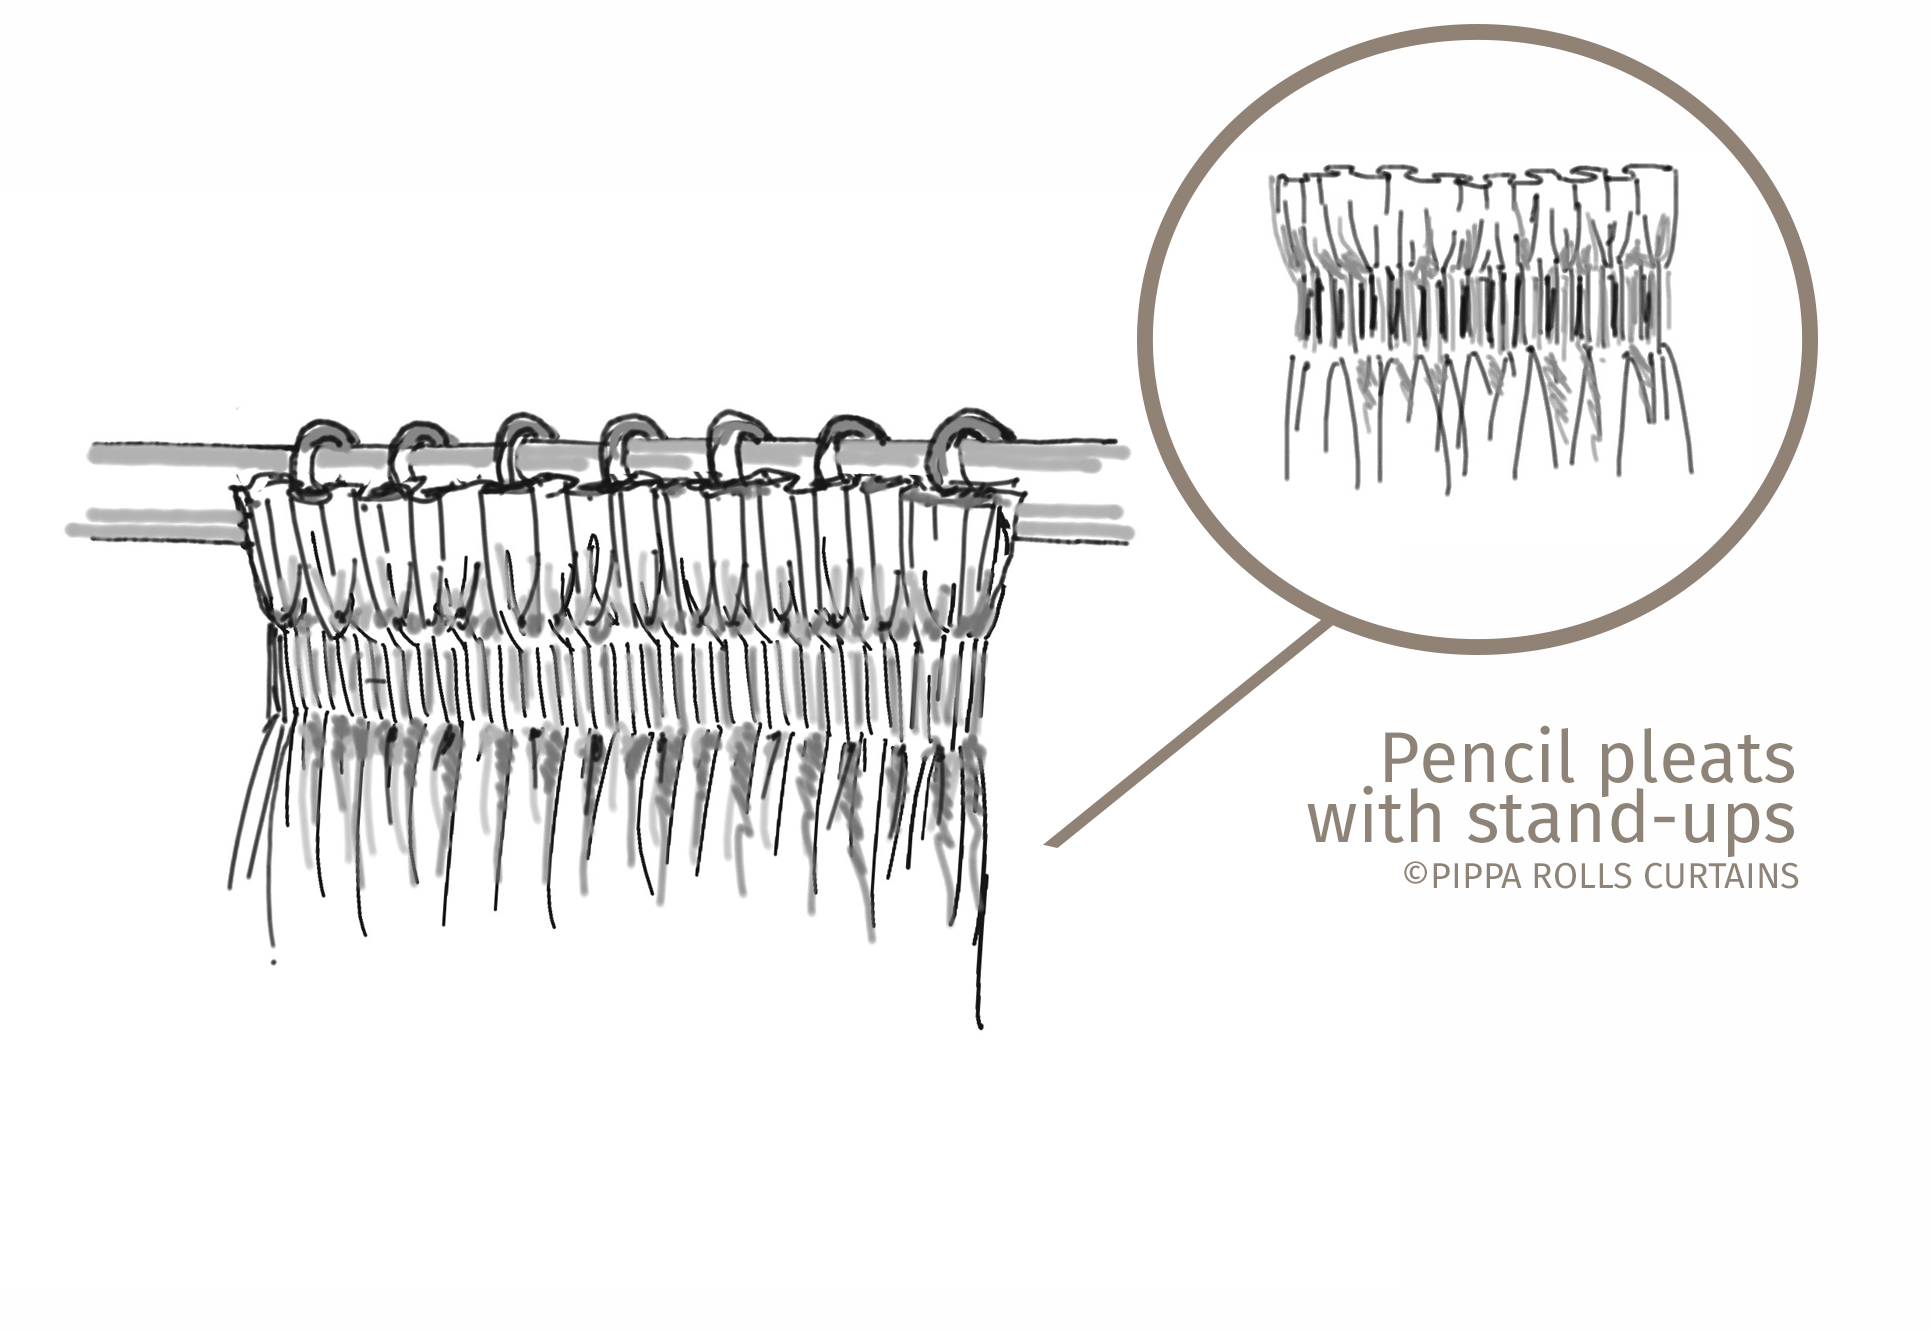 Pencil pleats with stand-ups jpeg.jpg